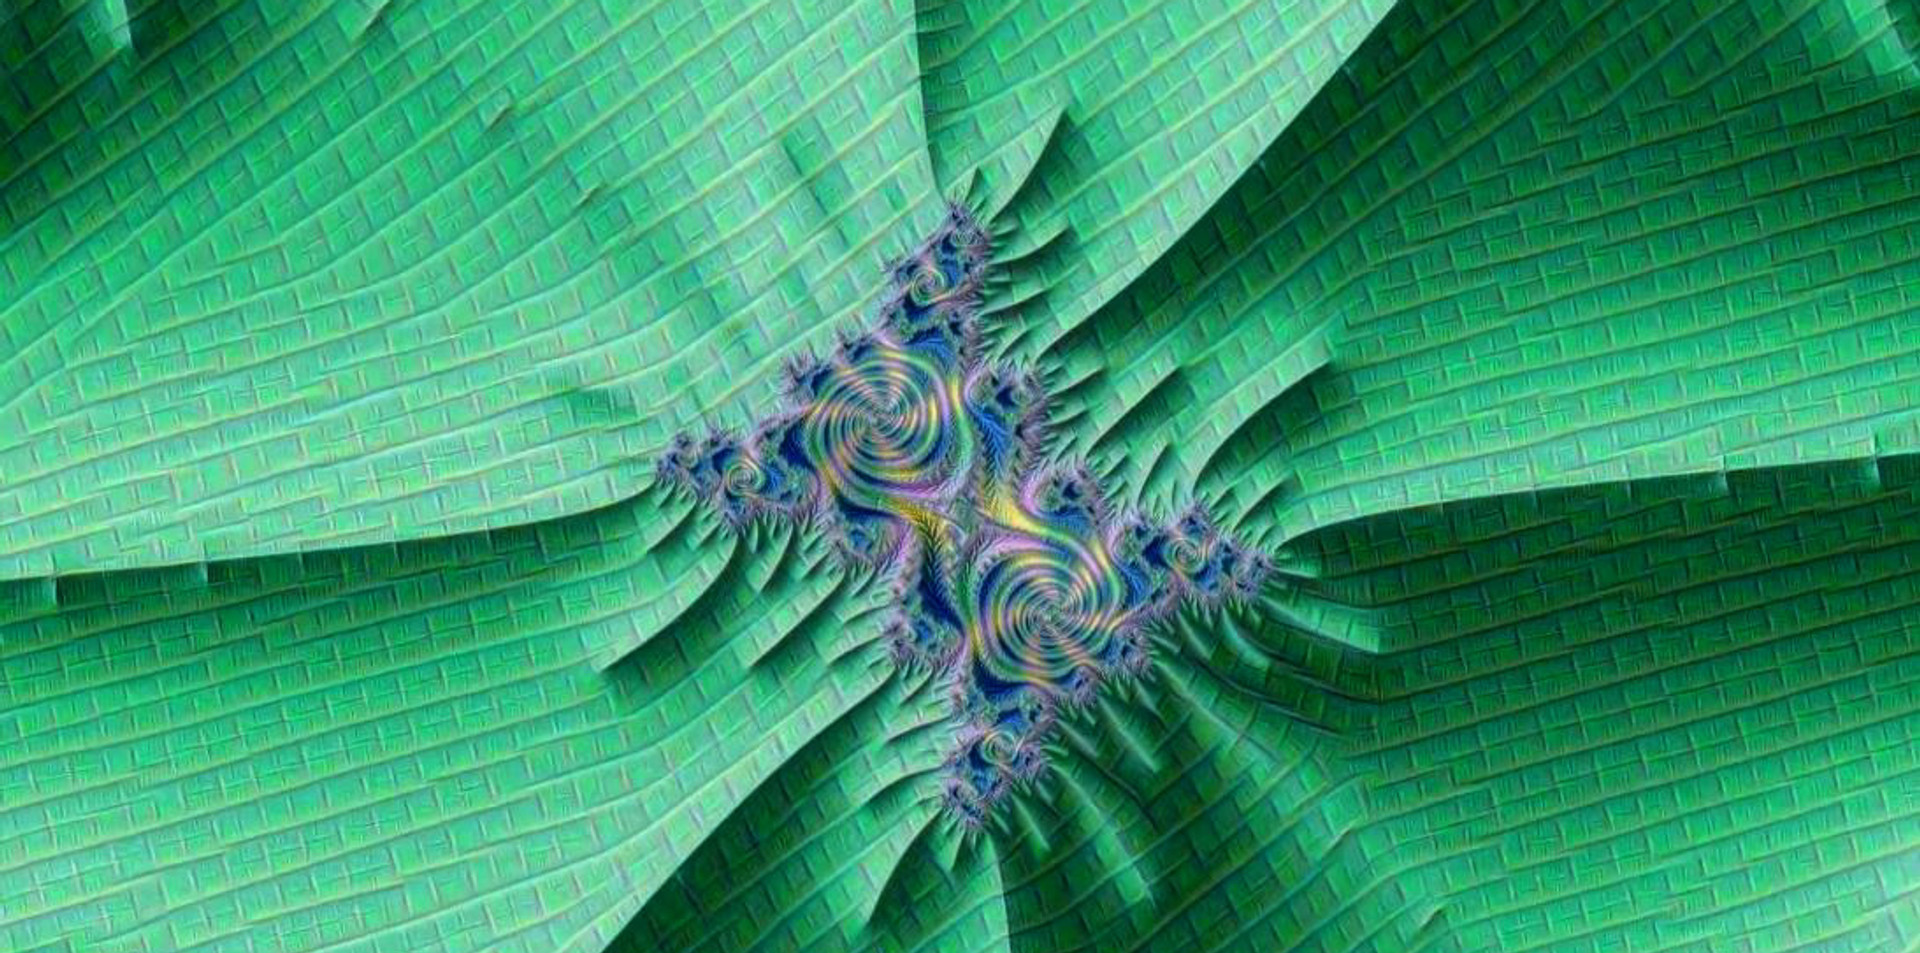 Mzr3bjmDD - Zoom Mandelbrot texturé par Inception.